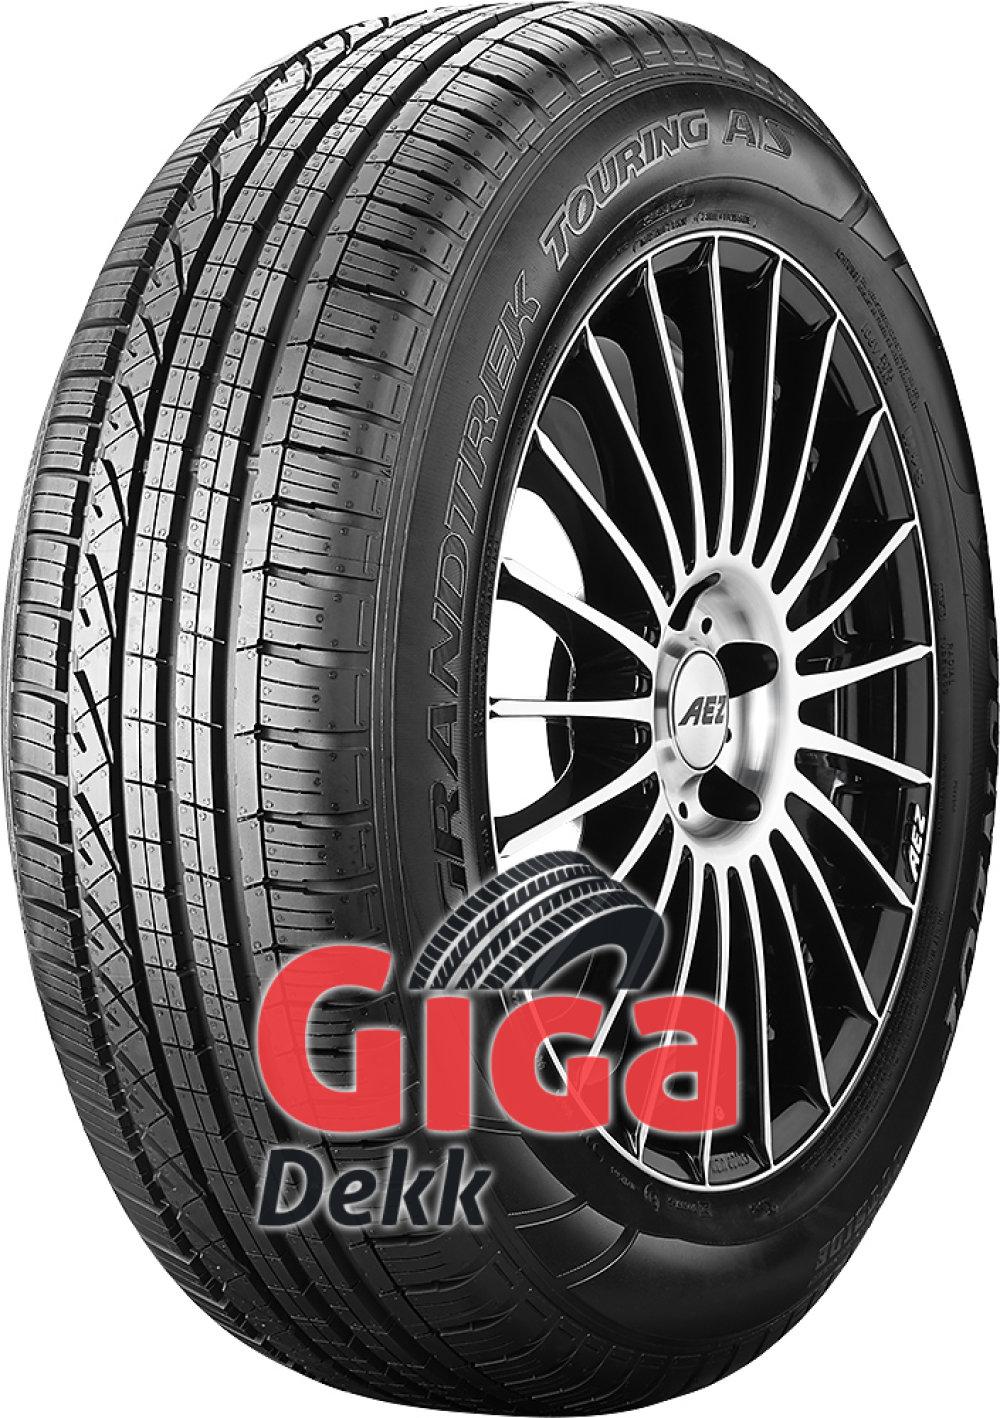 Dunlop Grandtrek Touring A/S ( 255/60 R17 106V )